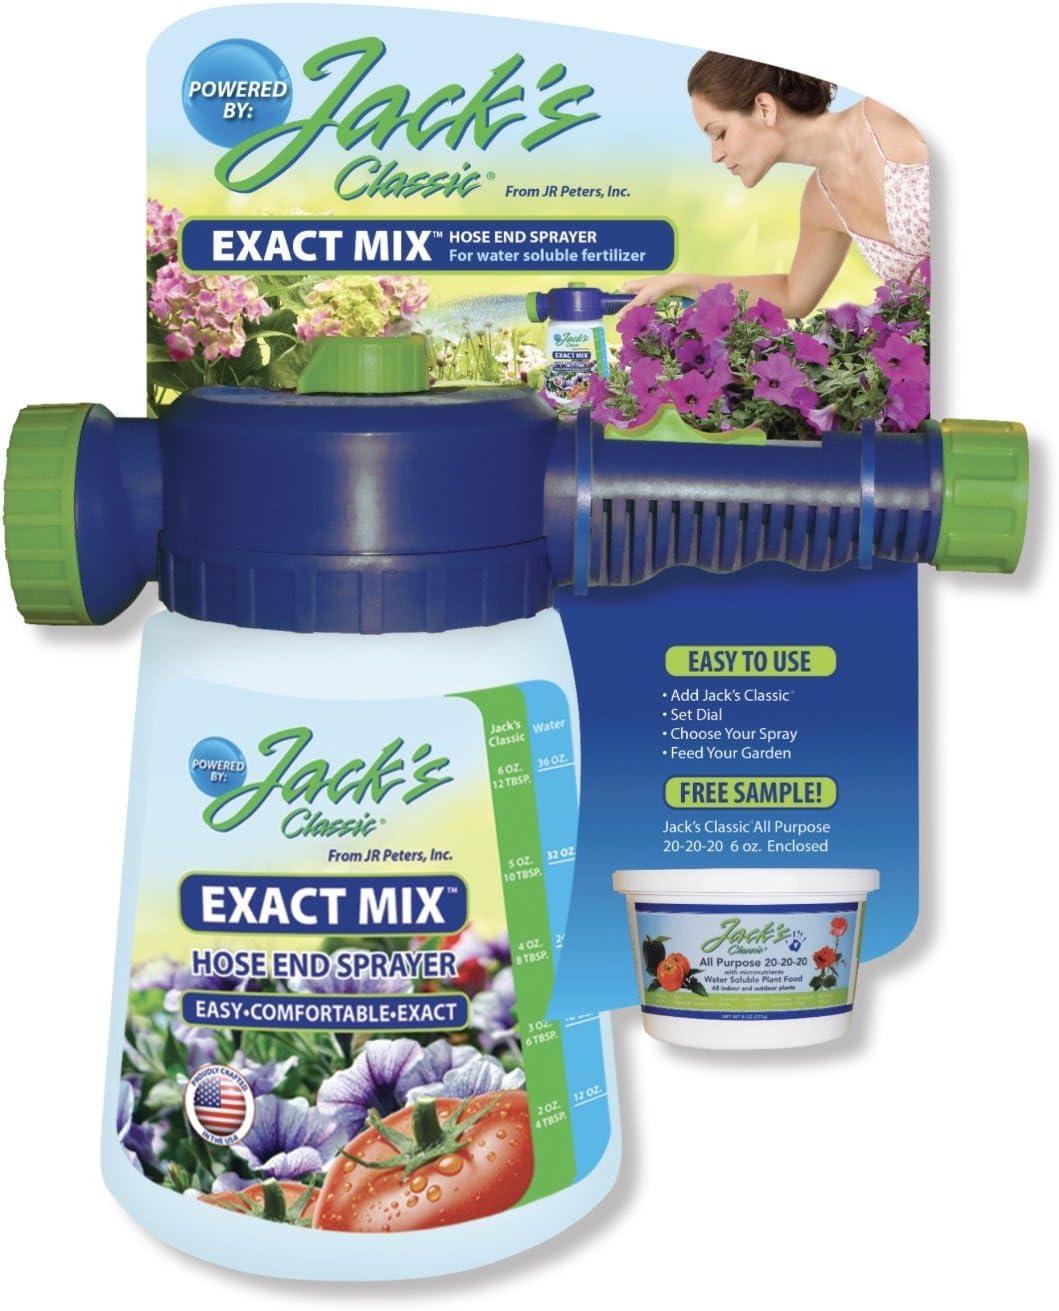 Jack's EXACT MIX Hose End Sprayer